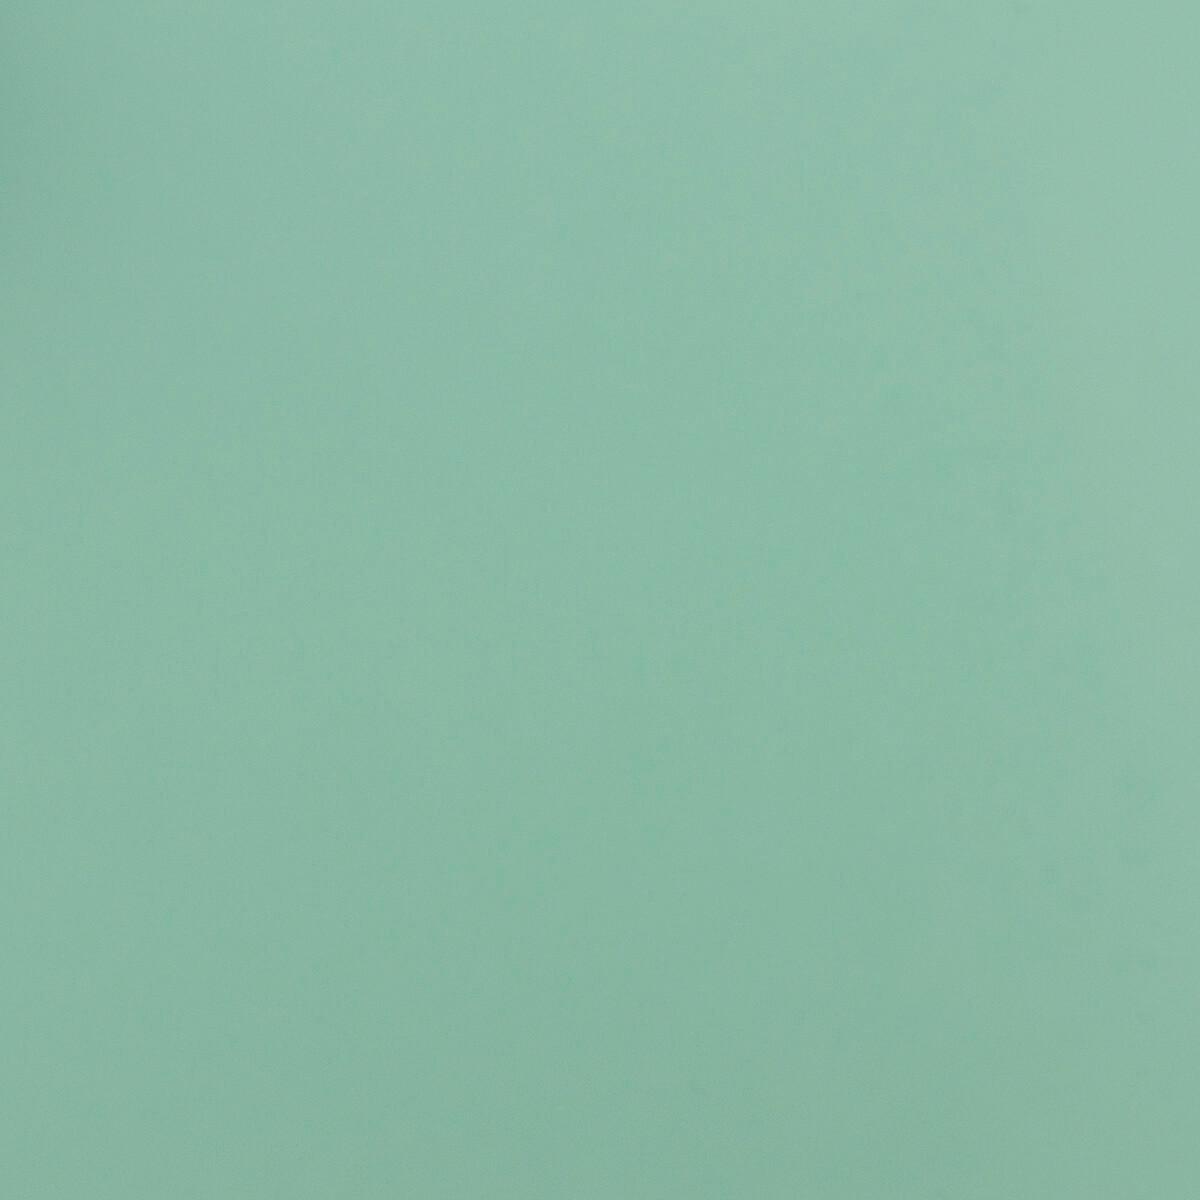 Pastel Green Hotmark Revolution HTV - Large Roll